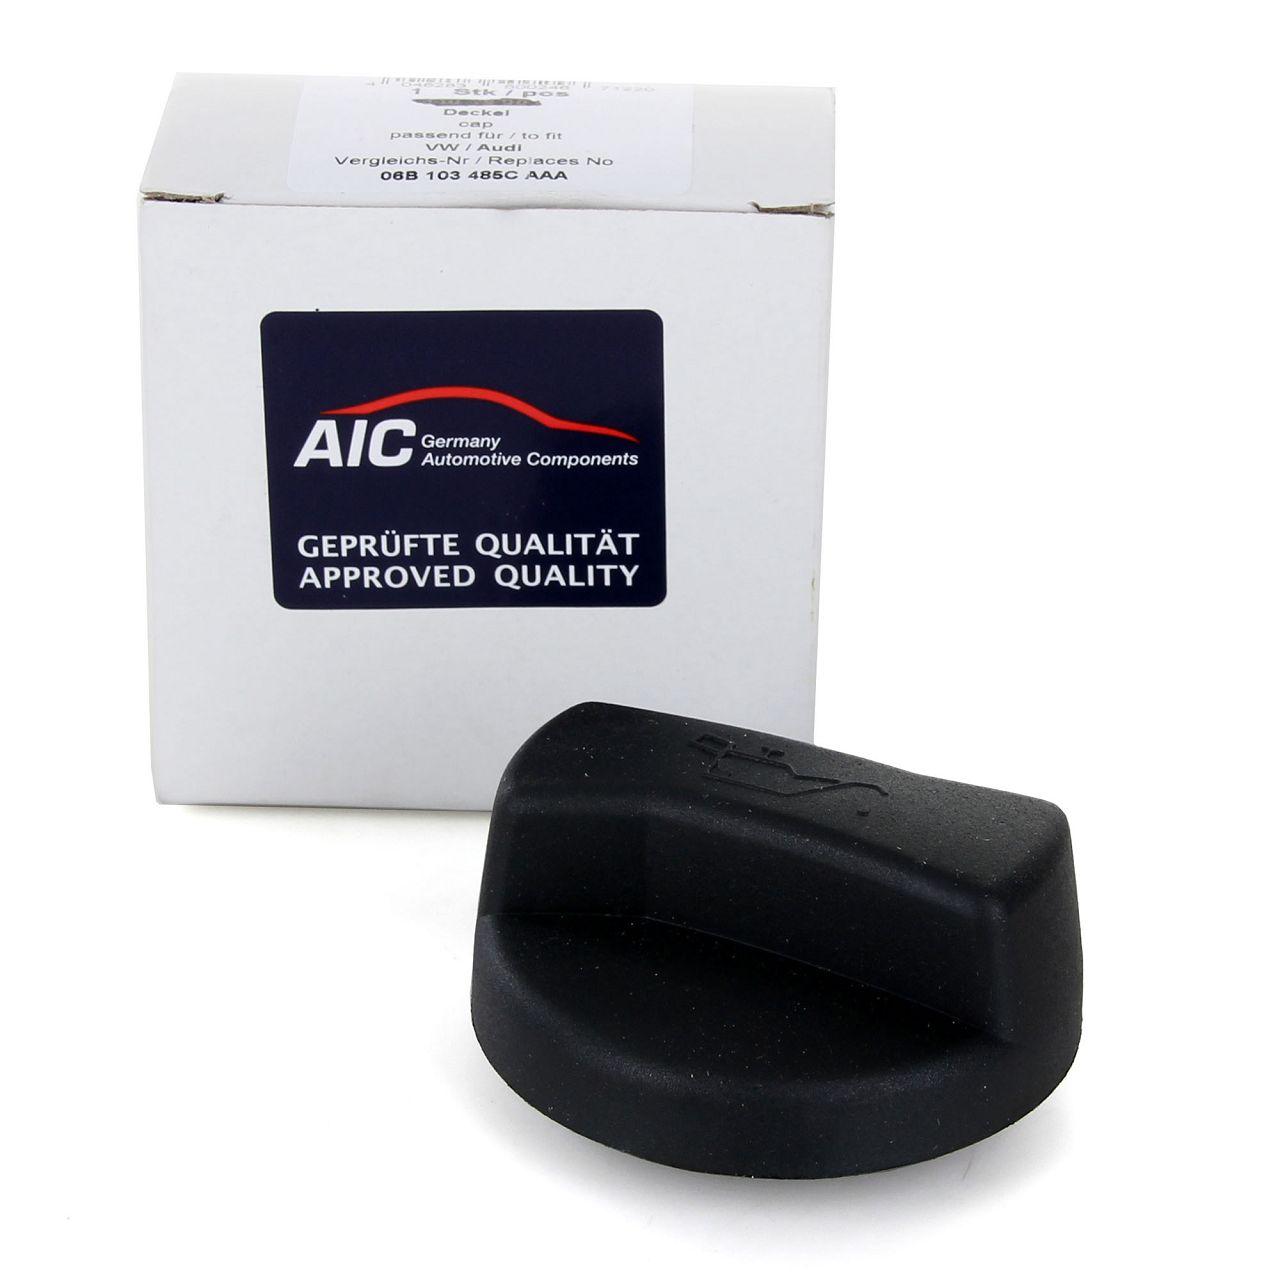 AIC Öldeckel Öleinfülldeckel für AUDI FORD SEAT SKODA VOLVO VW 06B103485C